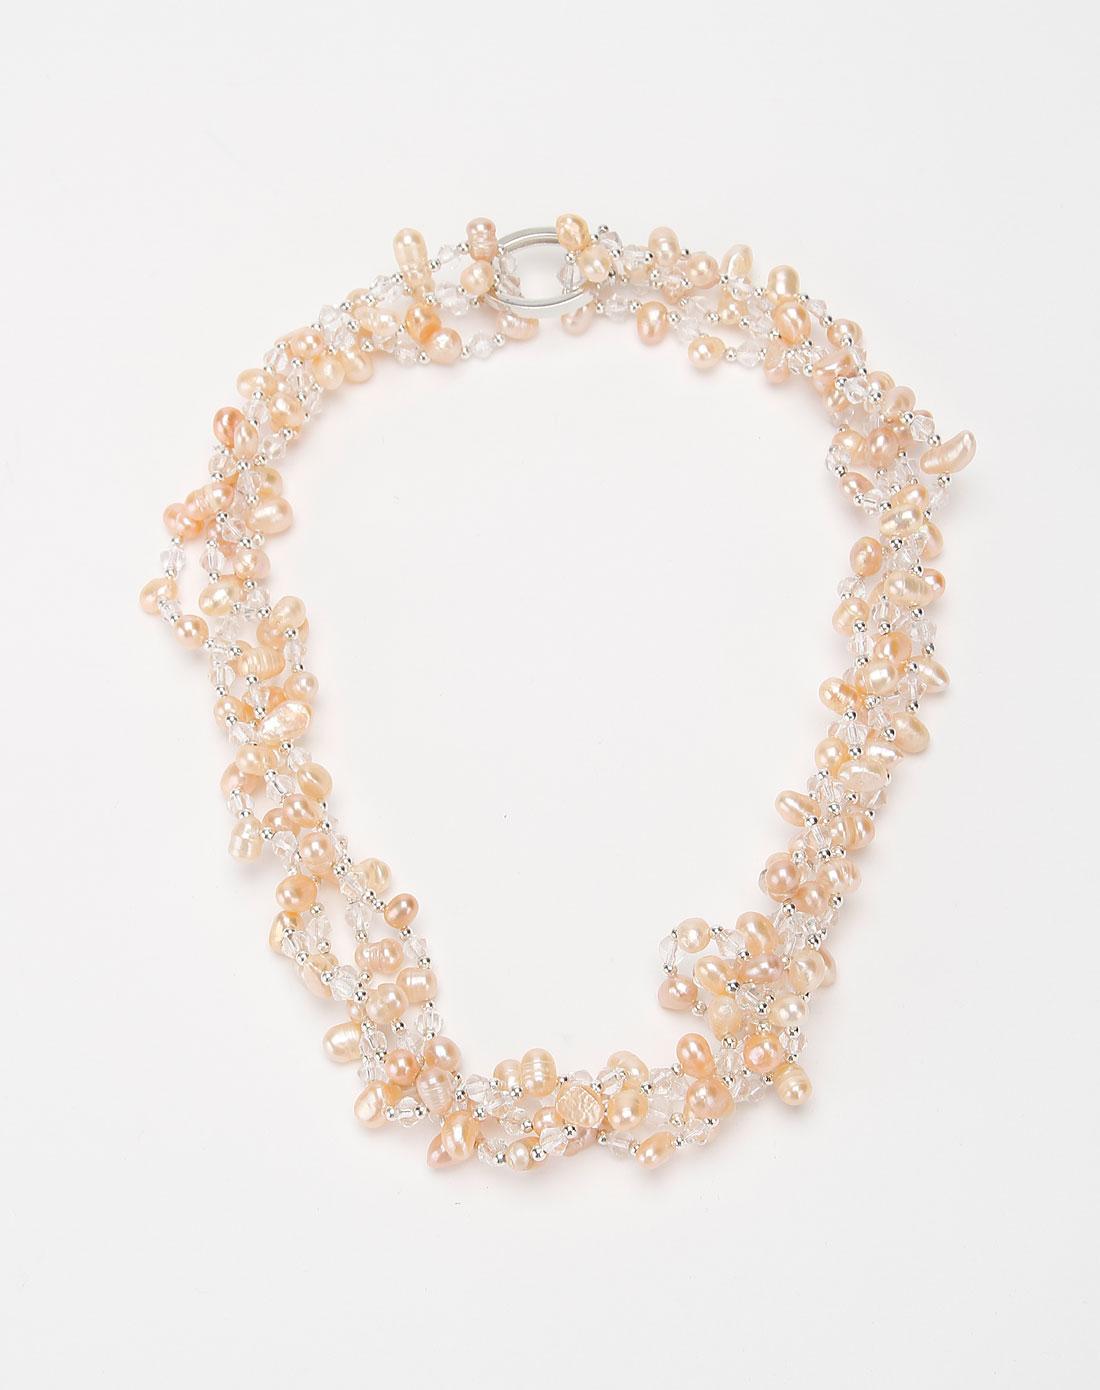 arrio浅粉红色时尚串珠项链